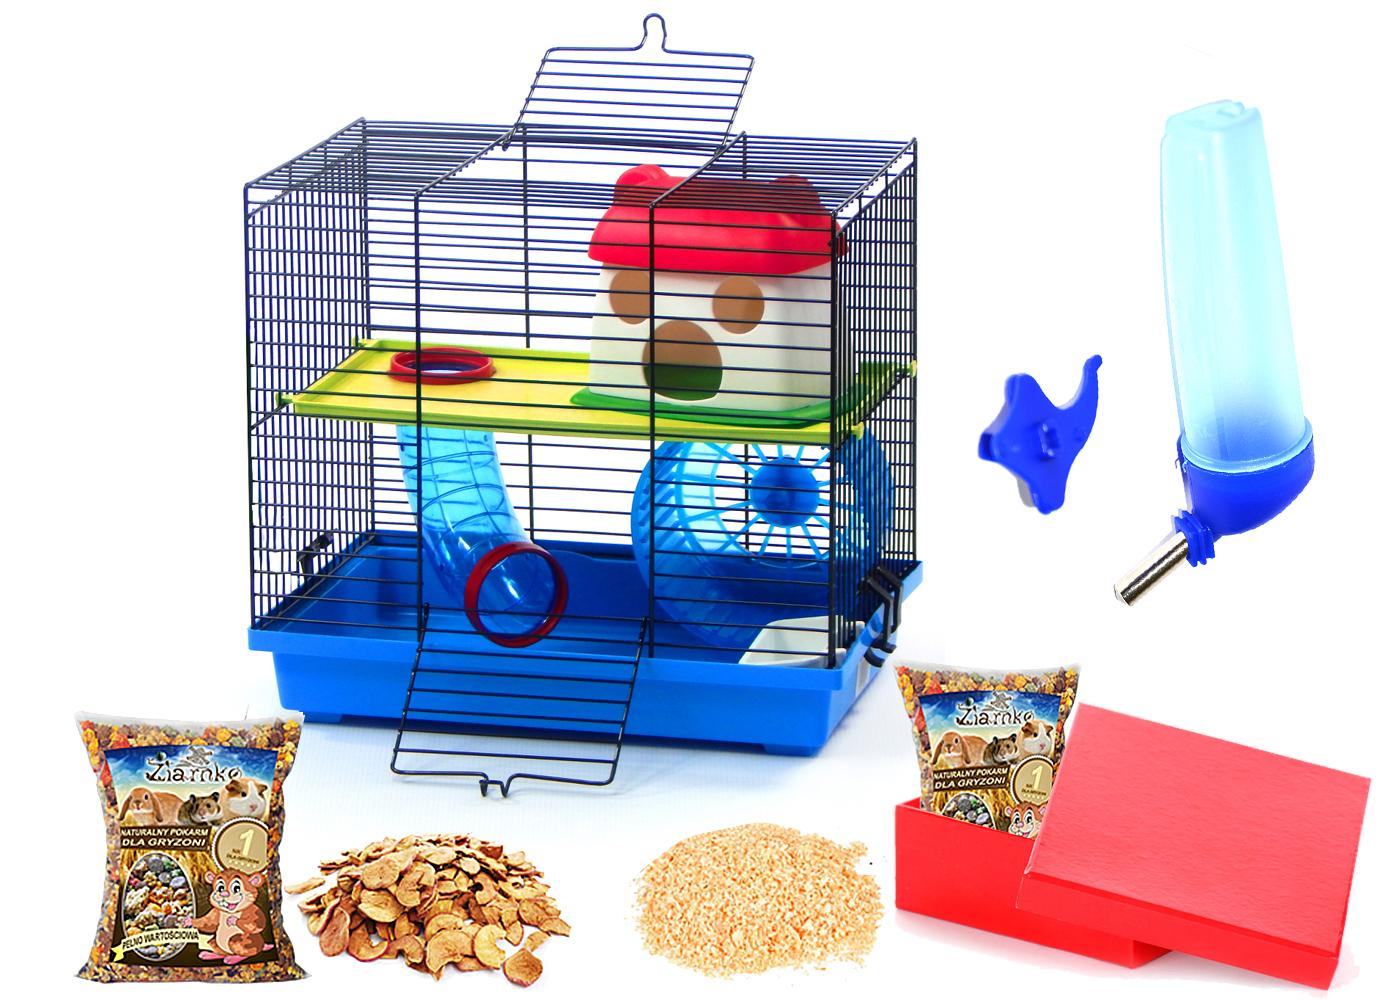 клетка ДЛЯ ХОМЯКА мышь ГРЫЗУНОВ +ОПИЛКИ+корм